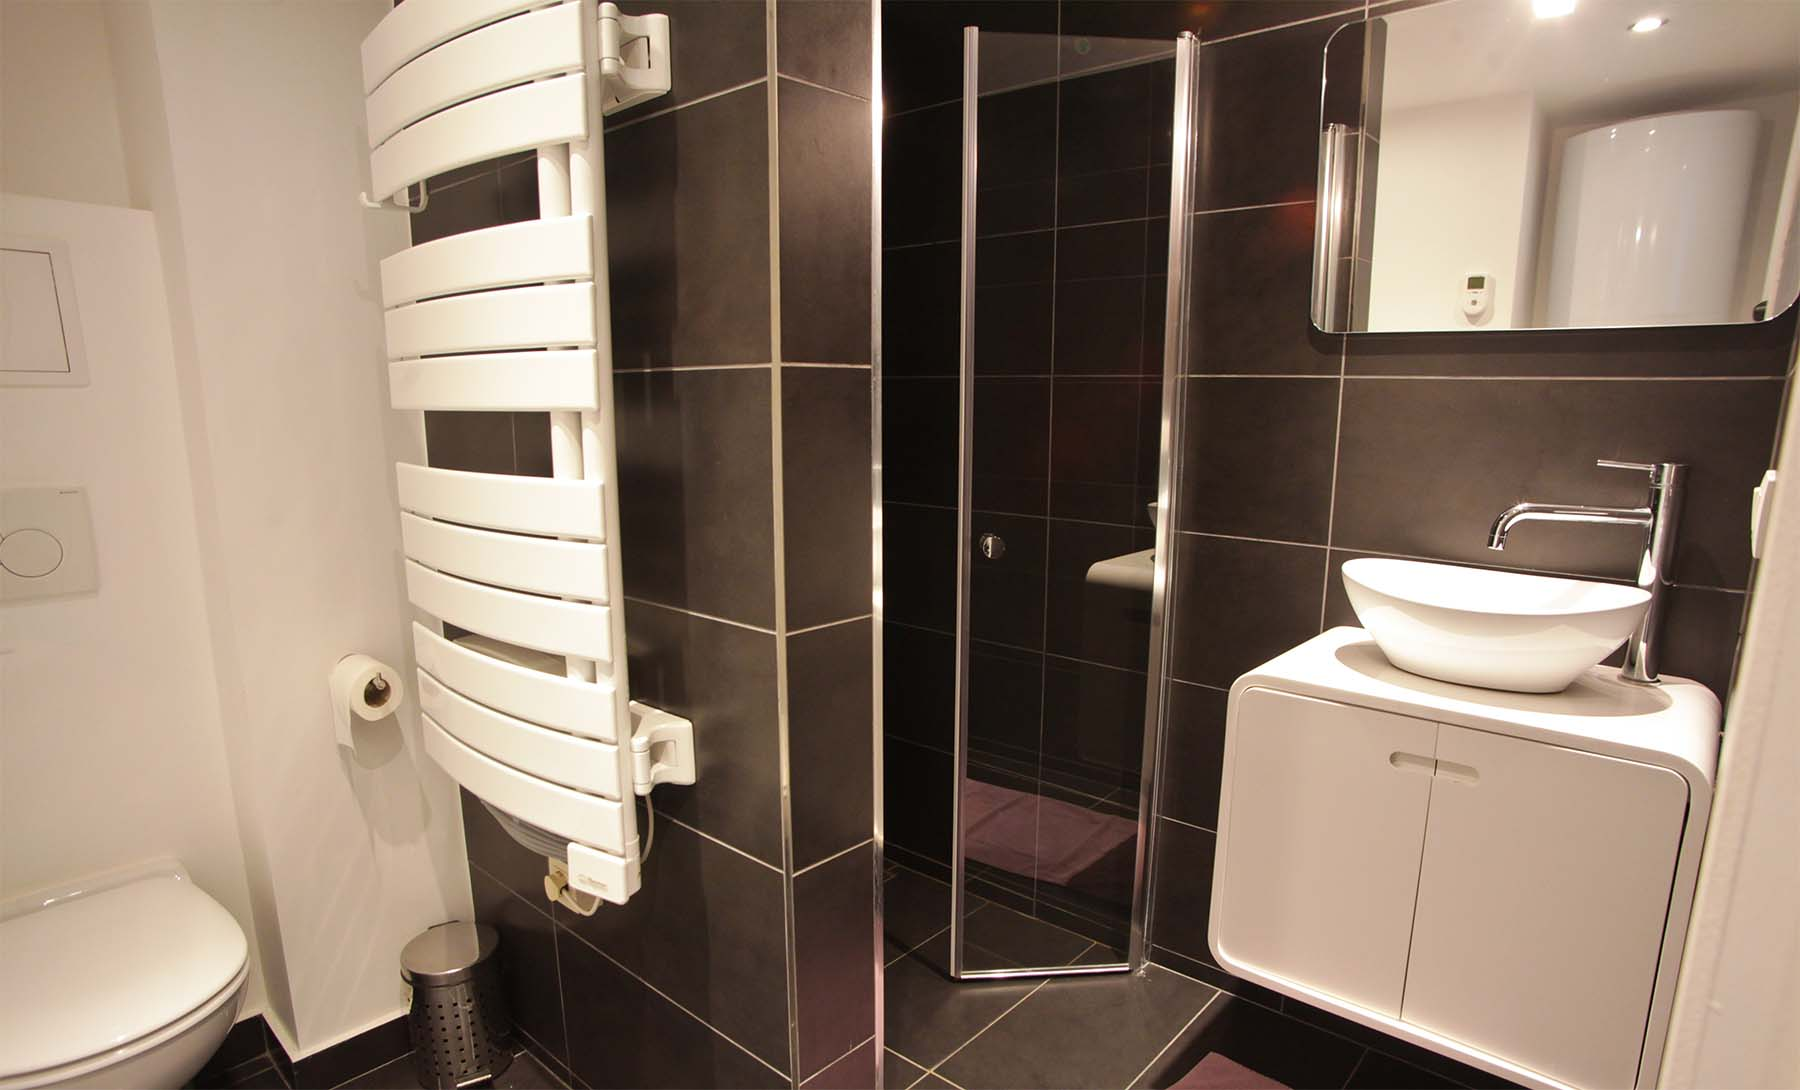 Appartment_0002_flat-brugmann-bathroom-2.jpg